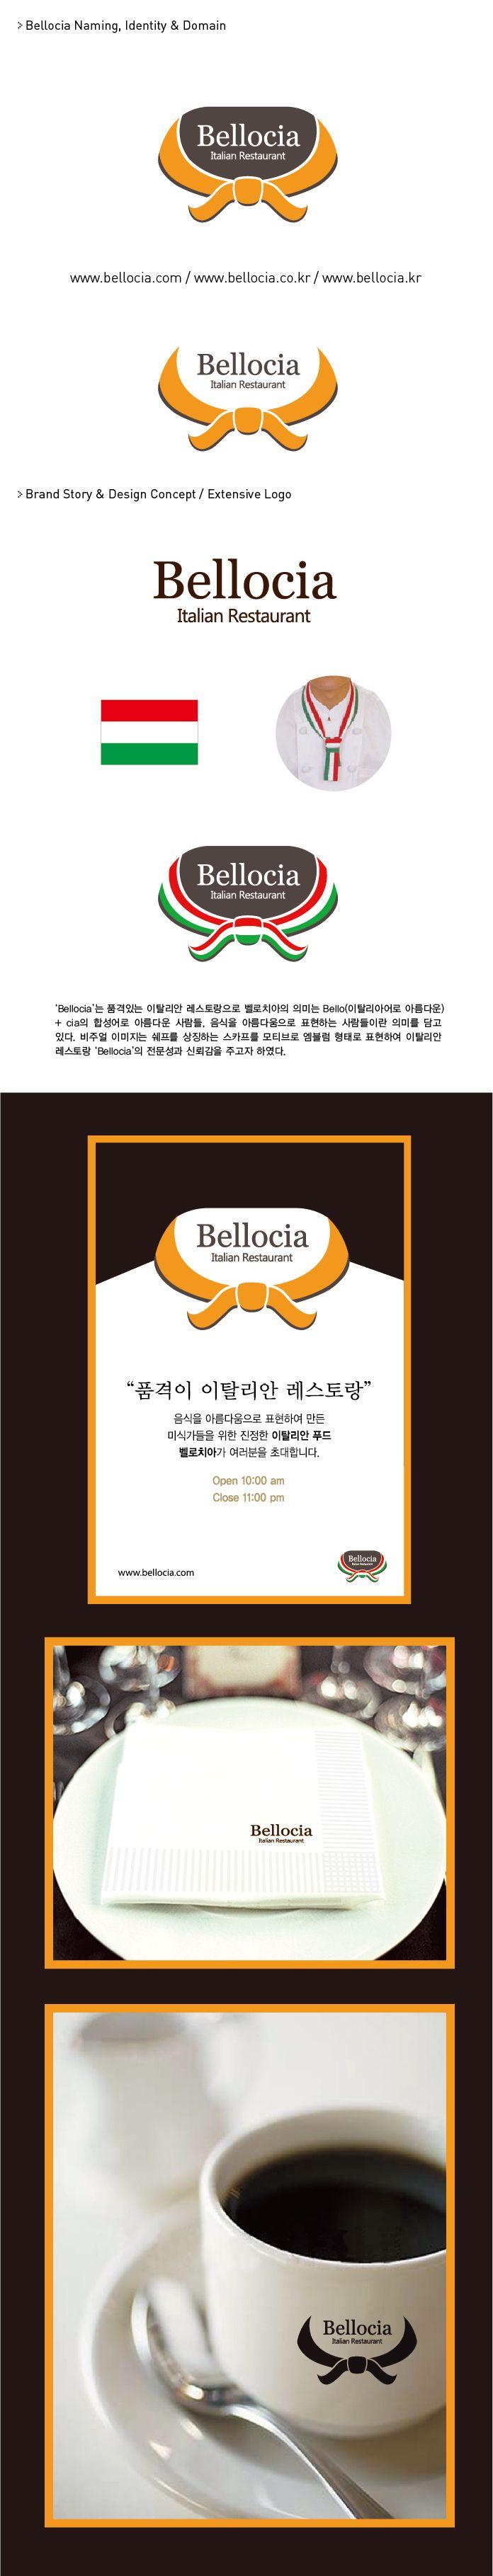 Bellocia logo design by injong, kim (벨로치아 로고 디자인)